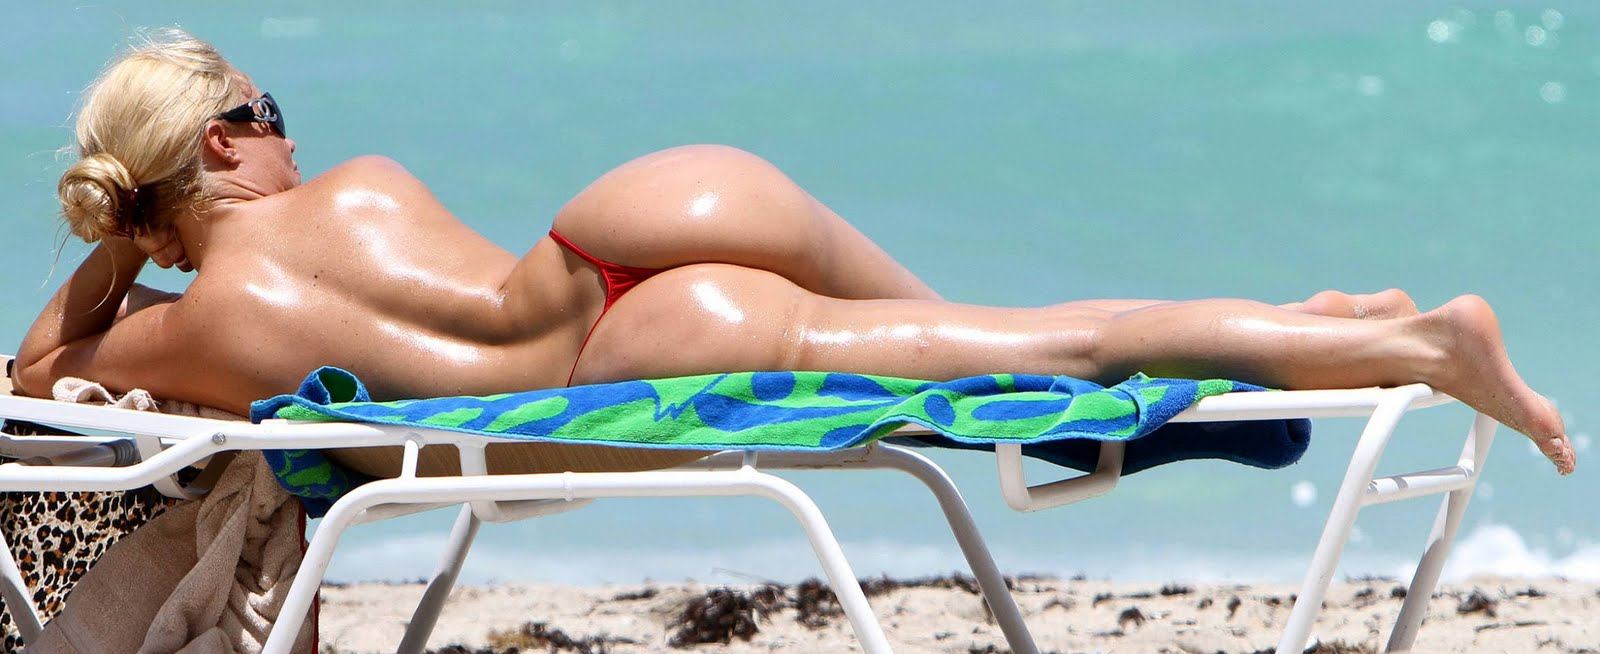 Nicole coco austin bikini opinion you